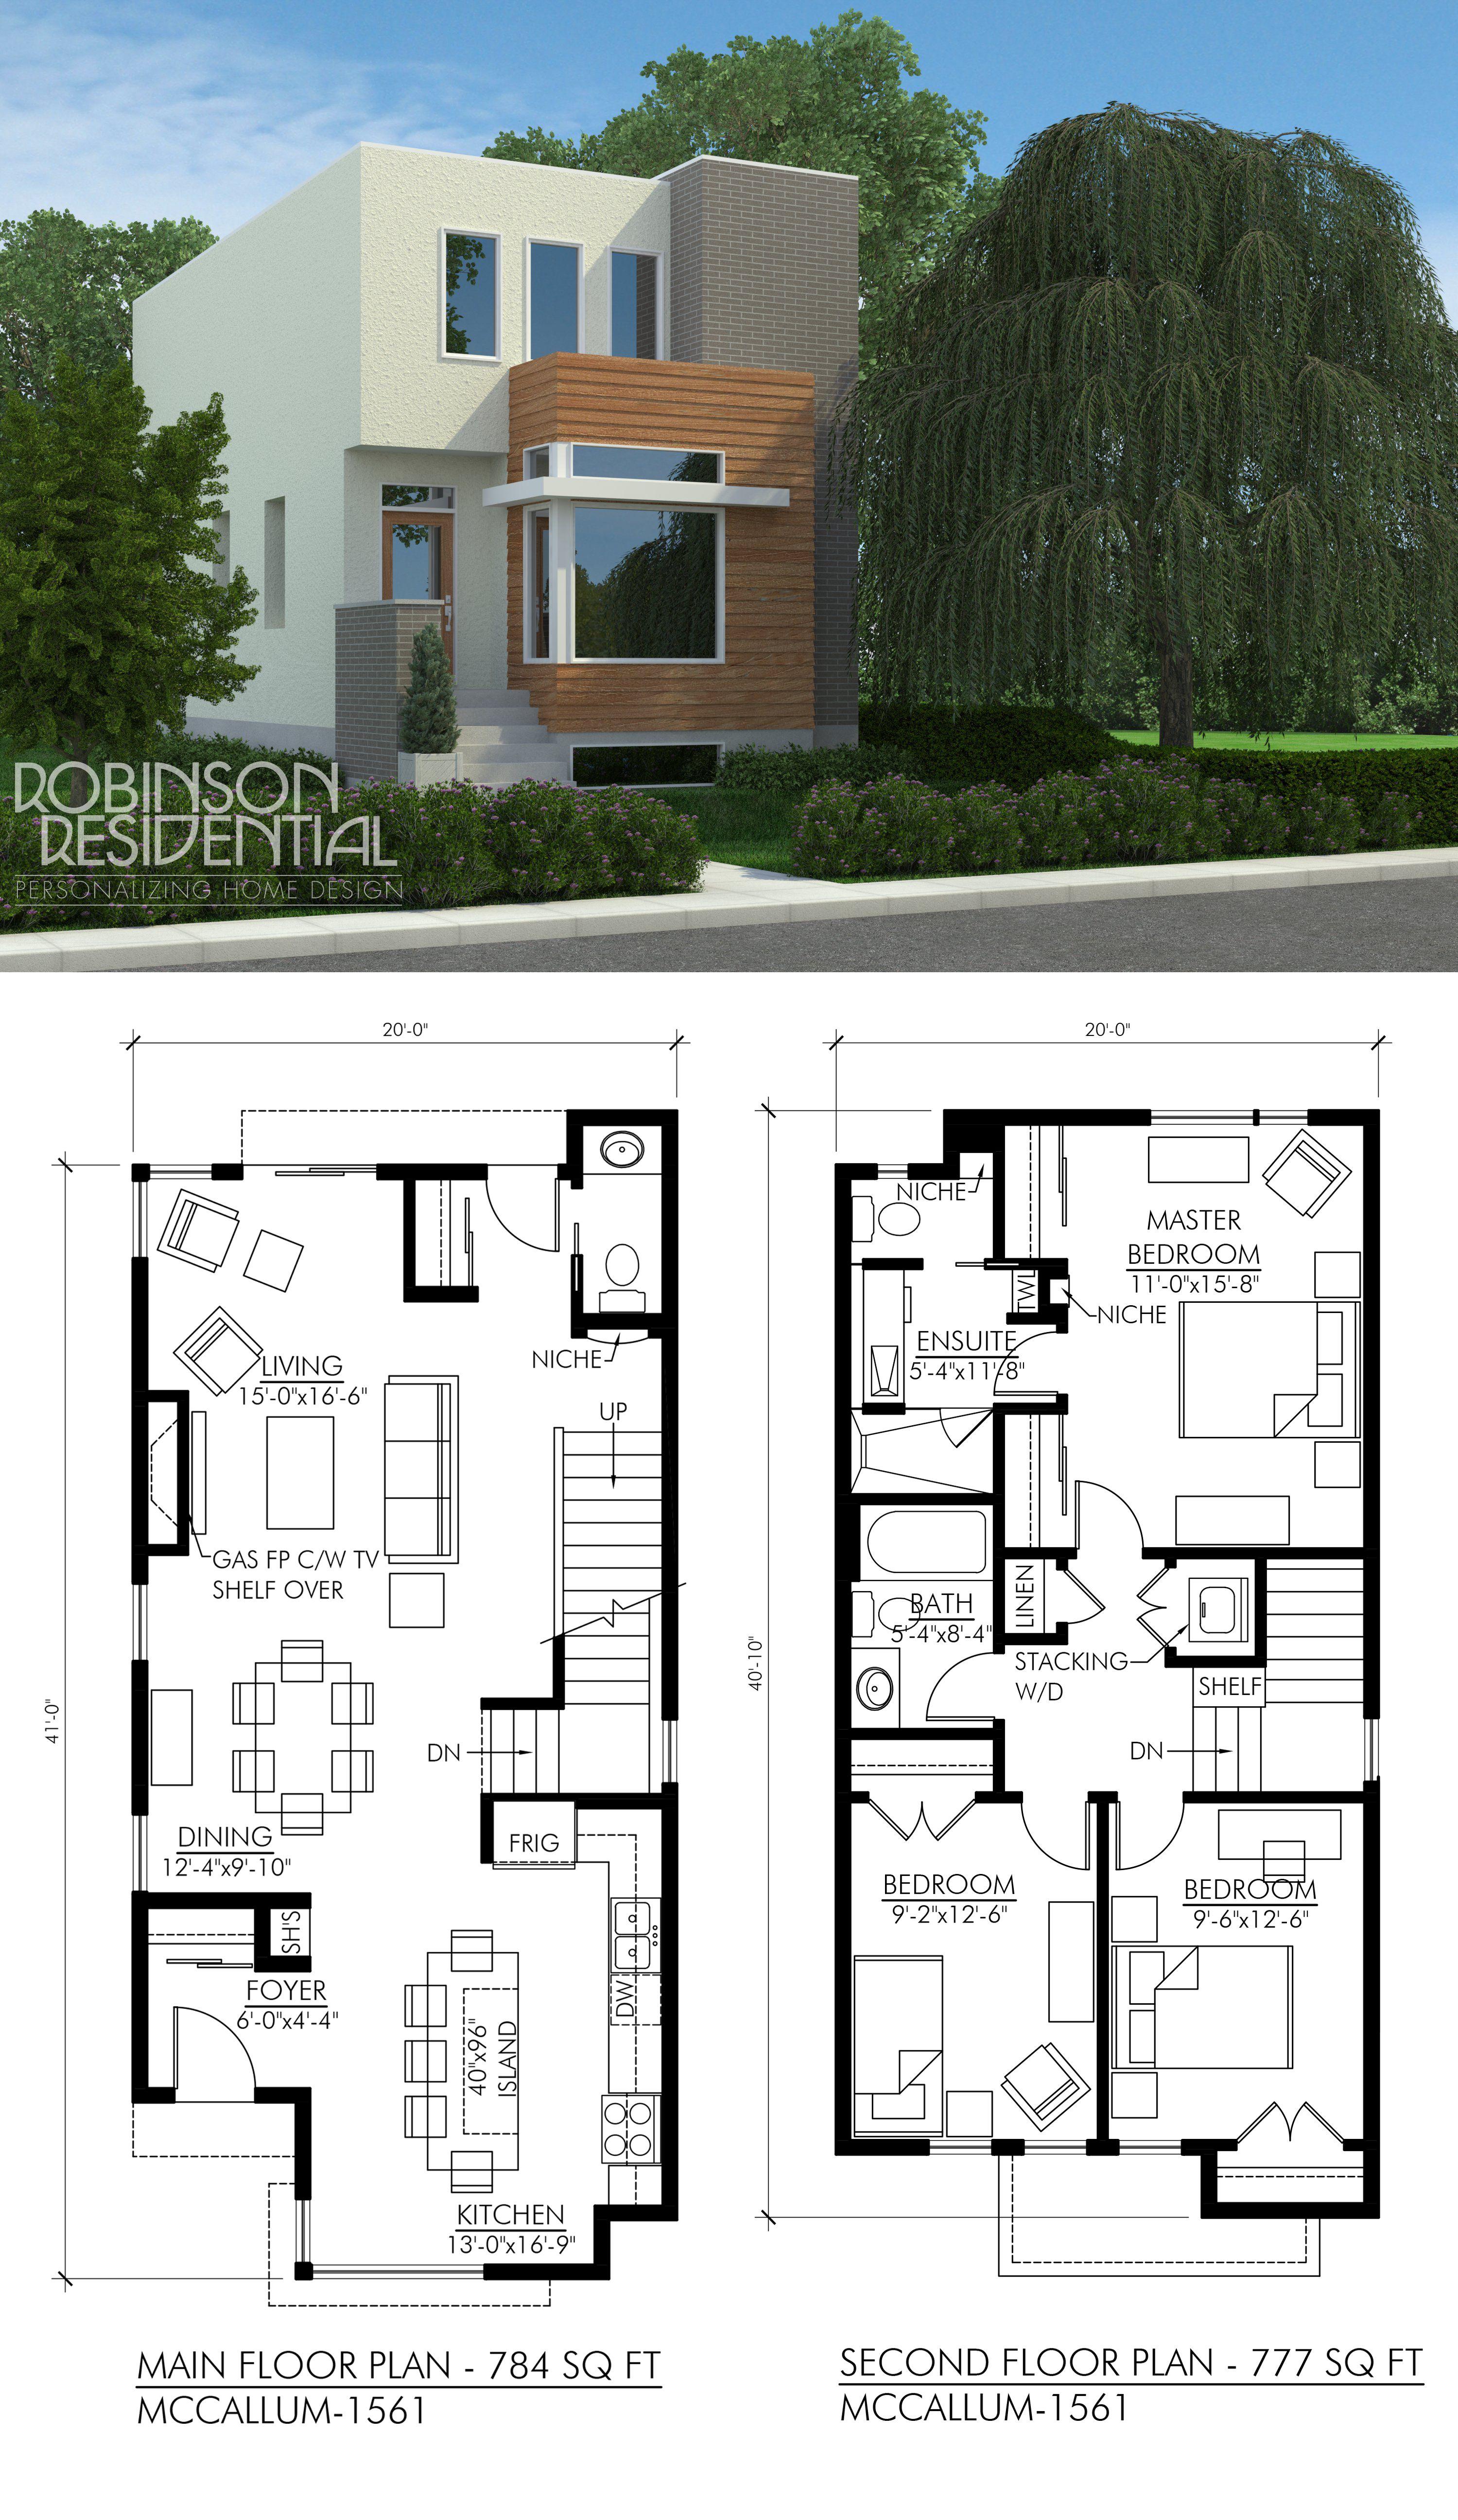 Floor plan 3 bdrm add side door for bsmnt suite access to stairs